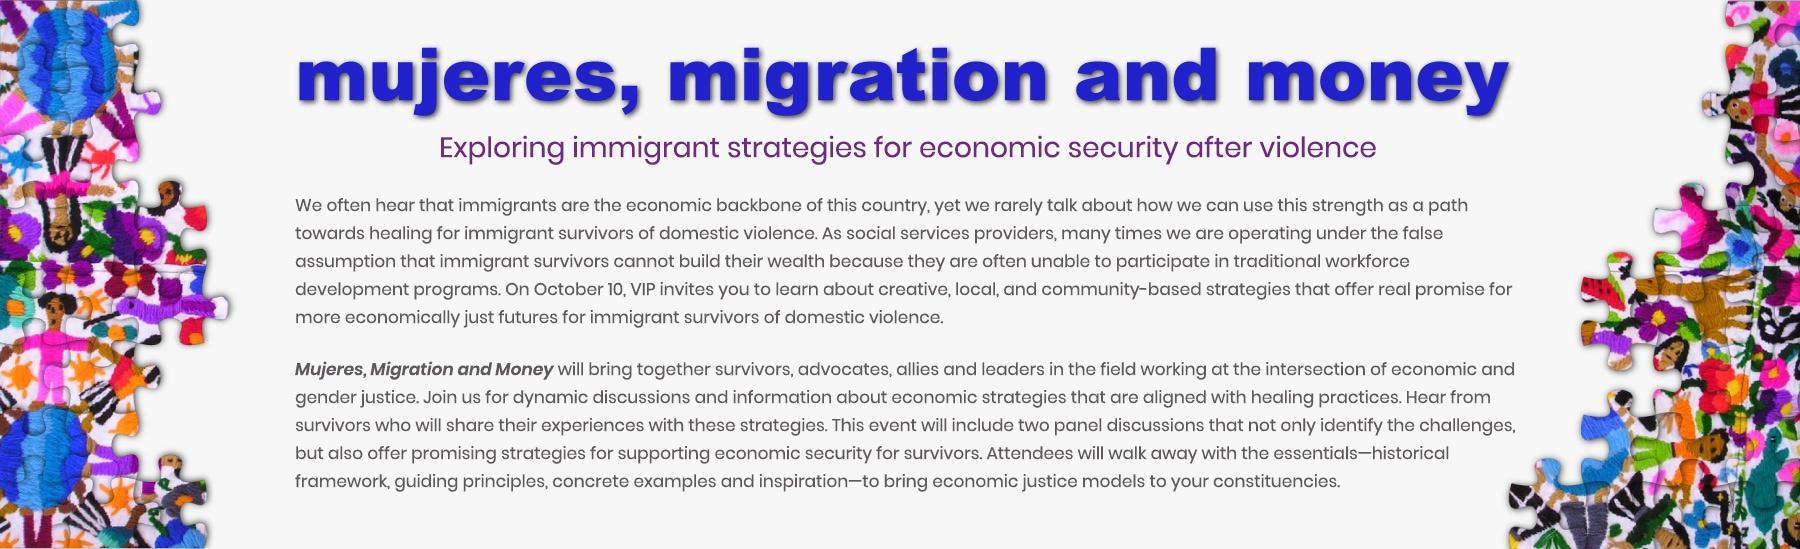 Image-MujeresMigration-EN-r1